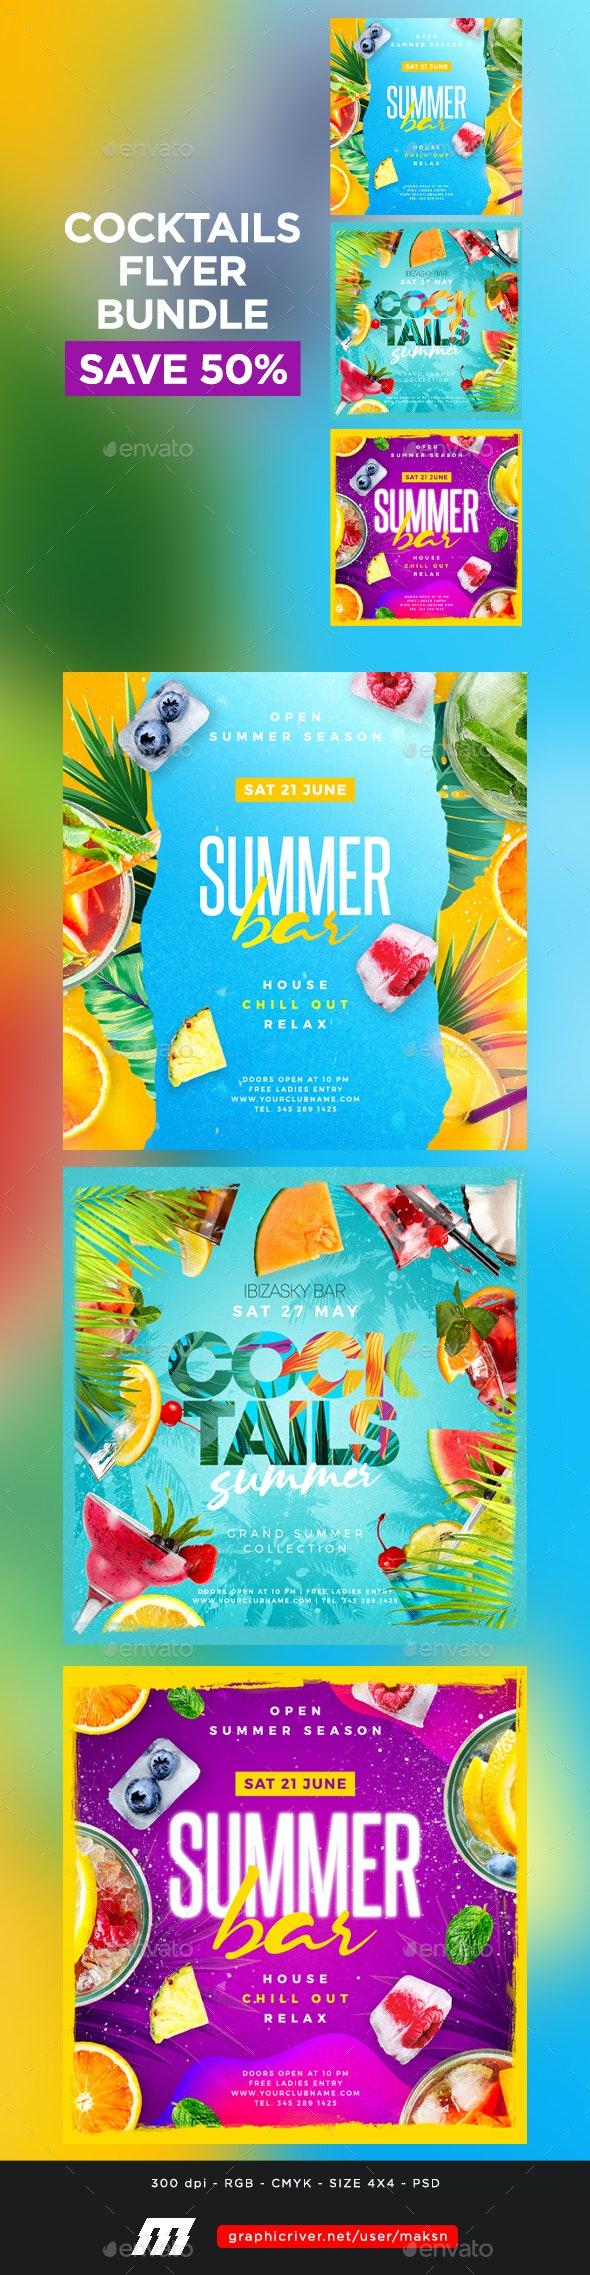 Cocktail Party Flyers Bundle - Clubs & Parties Events